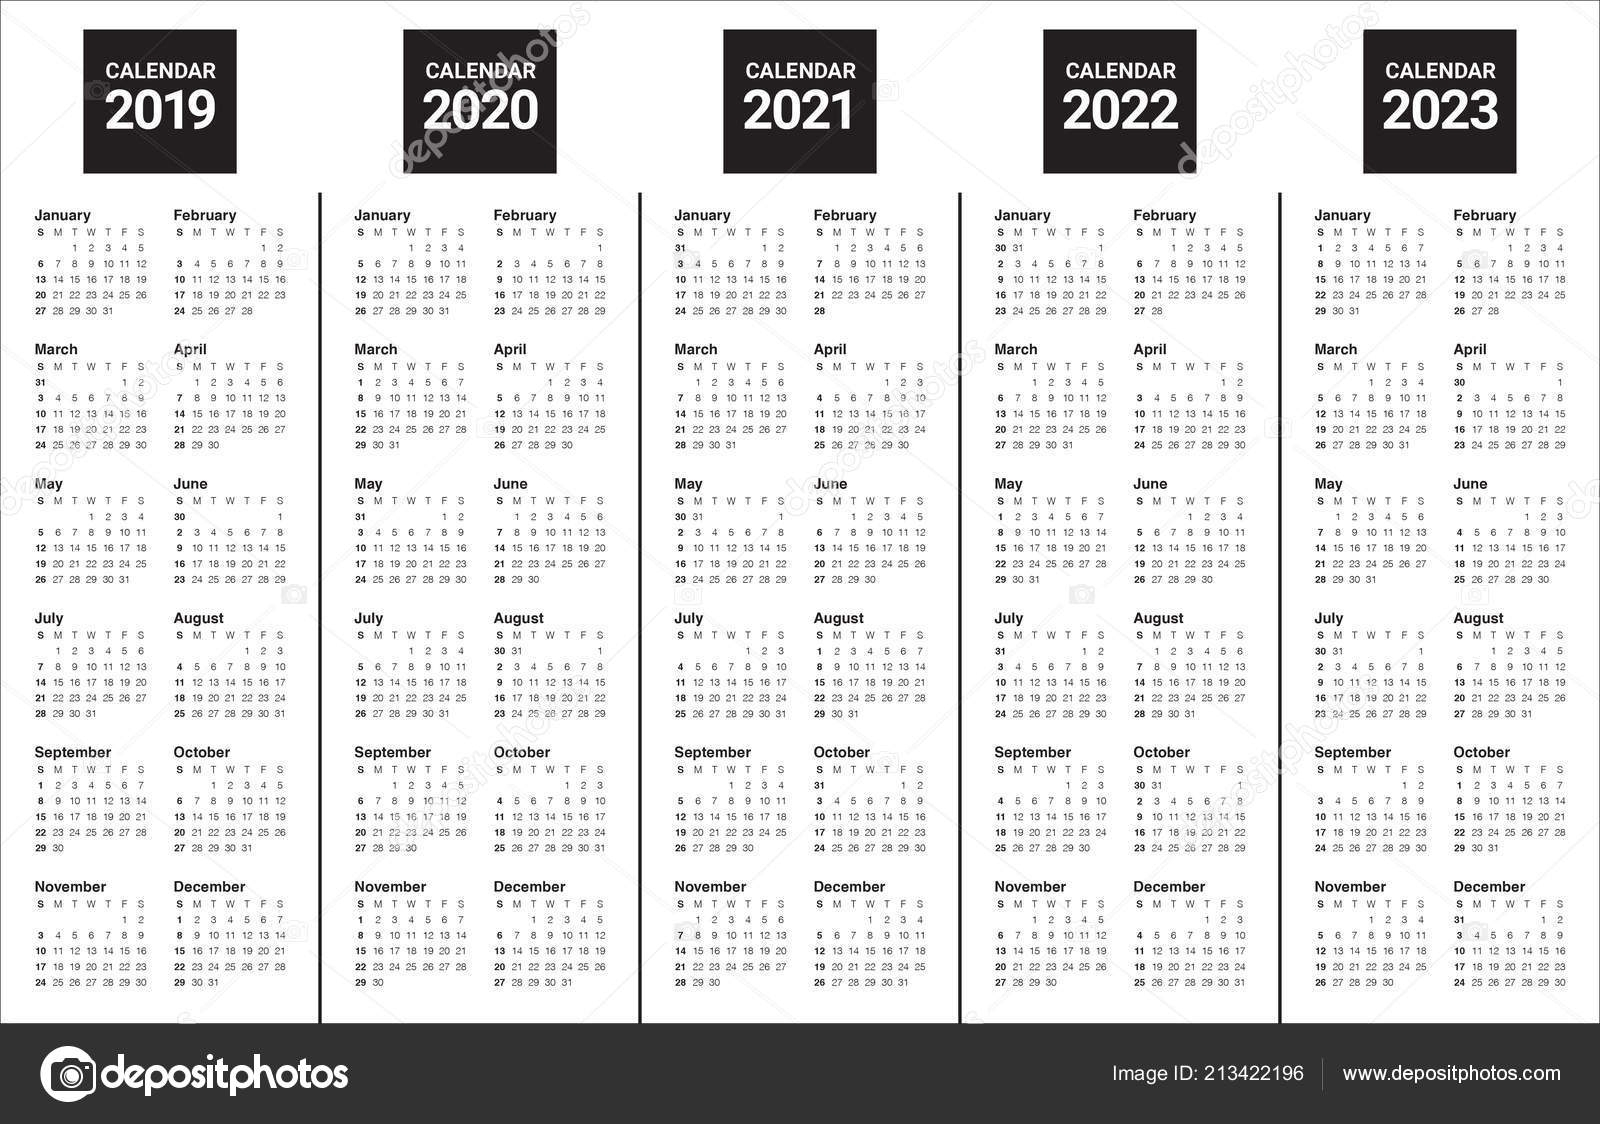 Year 2019 2020 2021 2022 2023 Calendar Vector Design Template intended for Printable Calendar For 2019/2020/2021/2022/2023